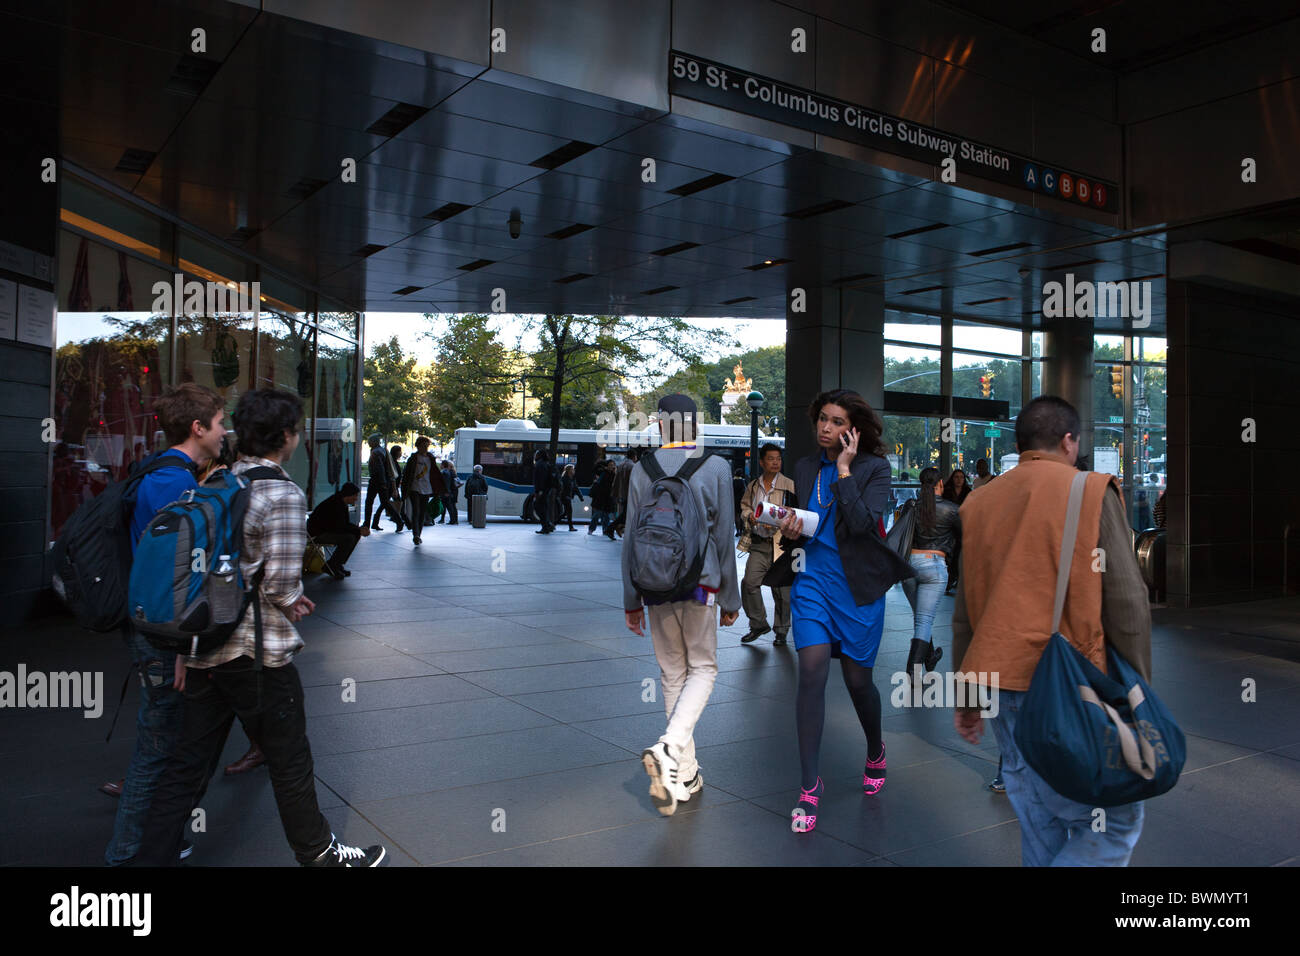 U.S.A., New York, Manhattan, Columbus Circle subway entrance - Stock Image